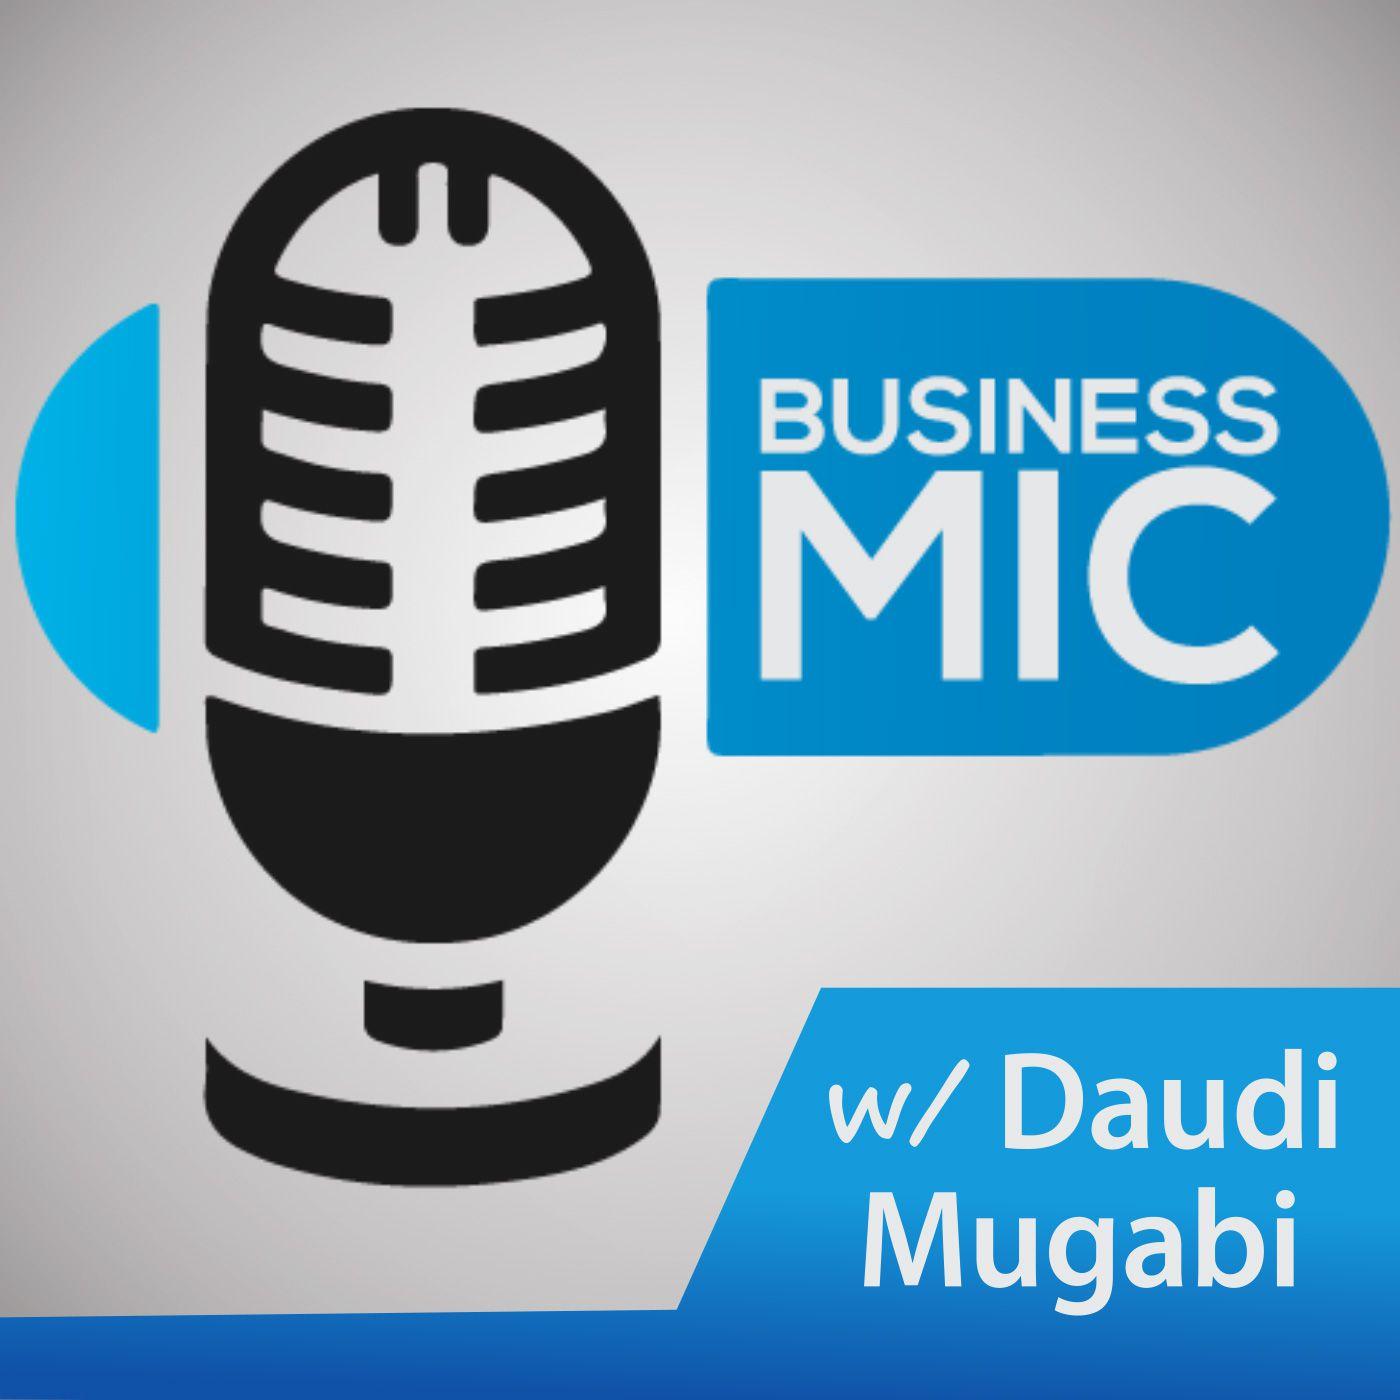 Business Mic